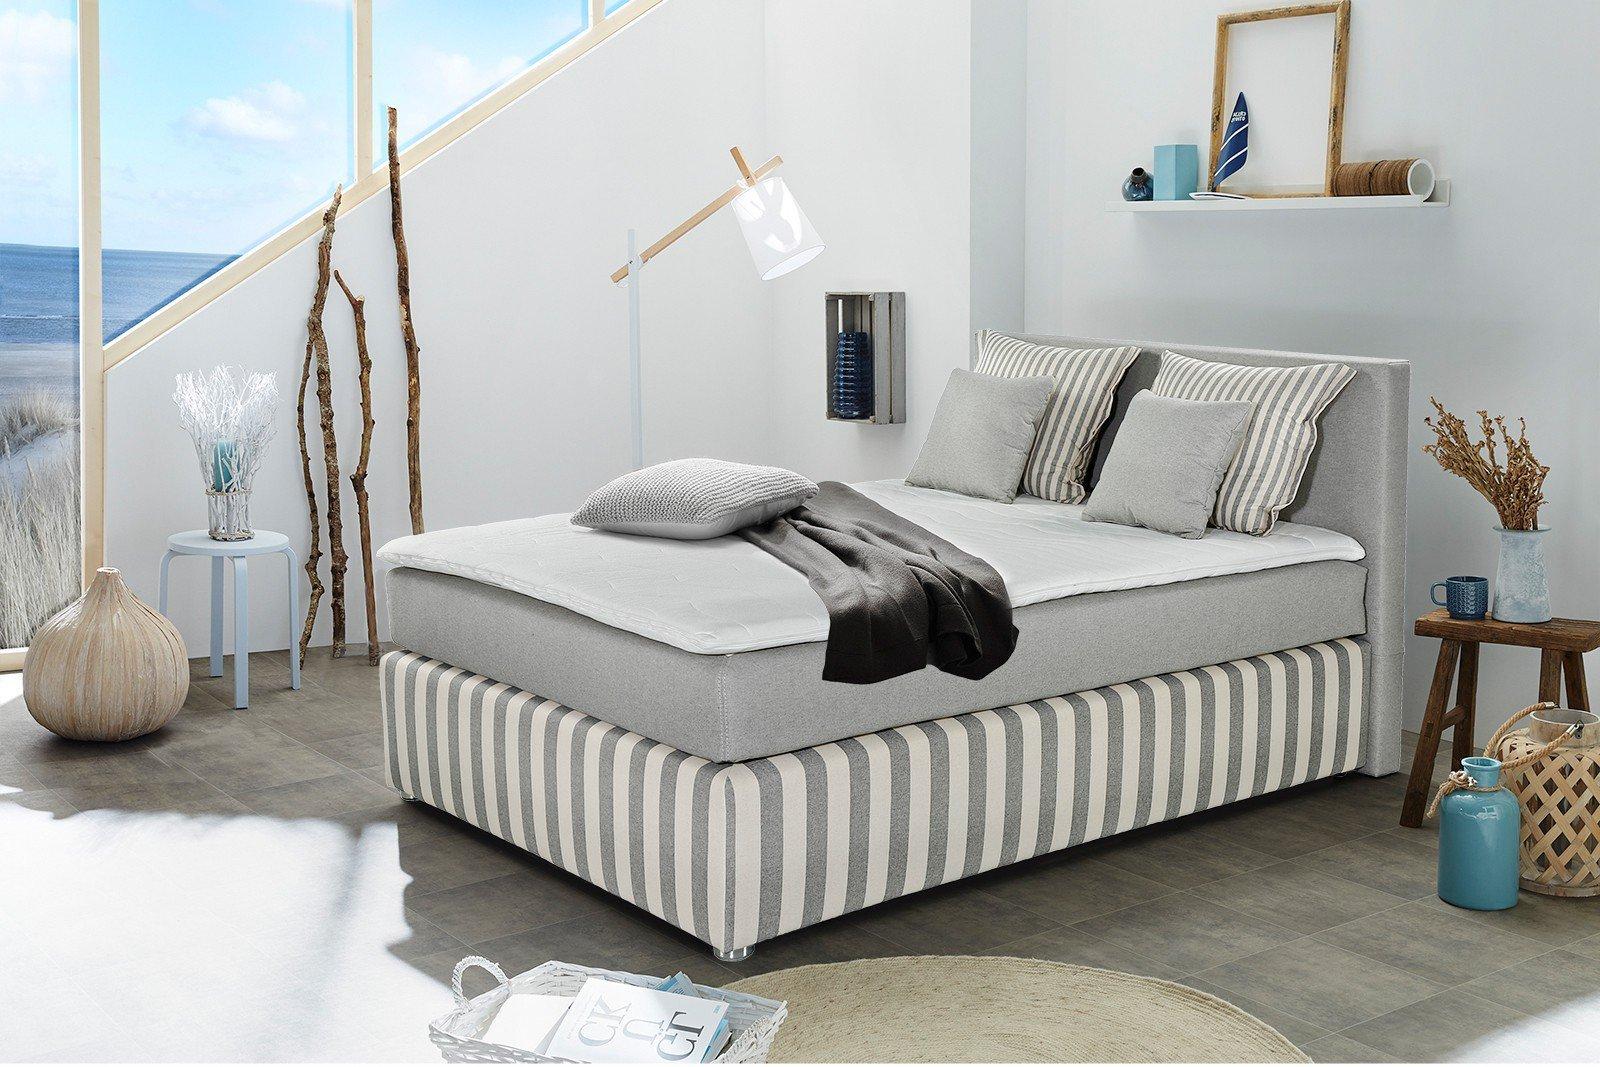 jockenh fer boxspringbett stino 140 x 200 cm grau. Black Bedroom Furniture Sets. Home Design Ideas